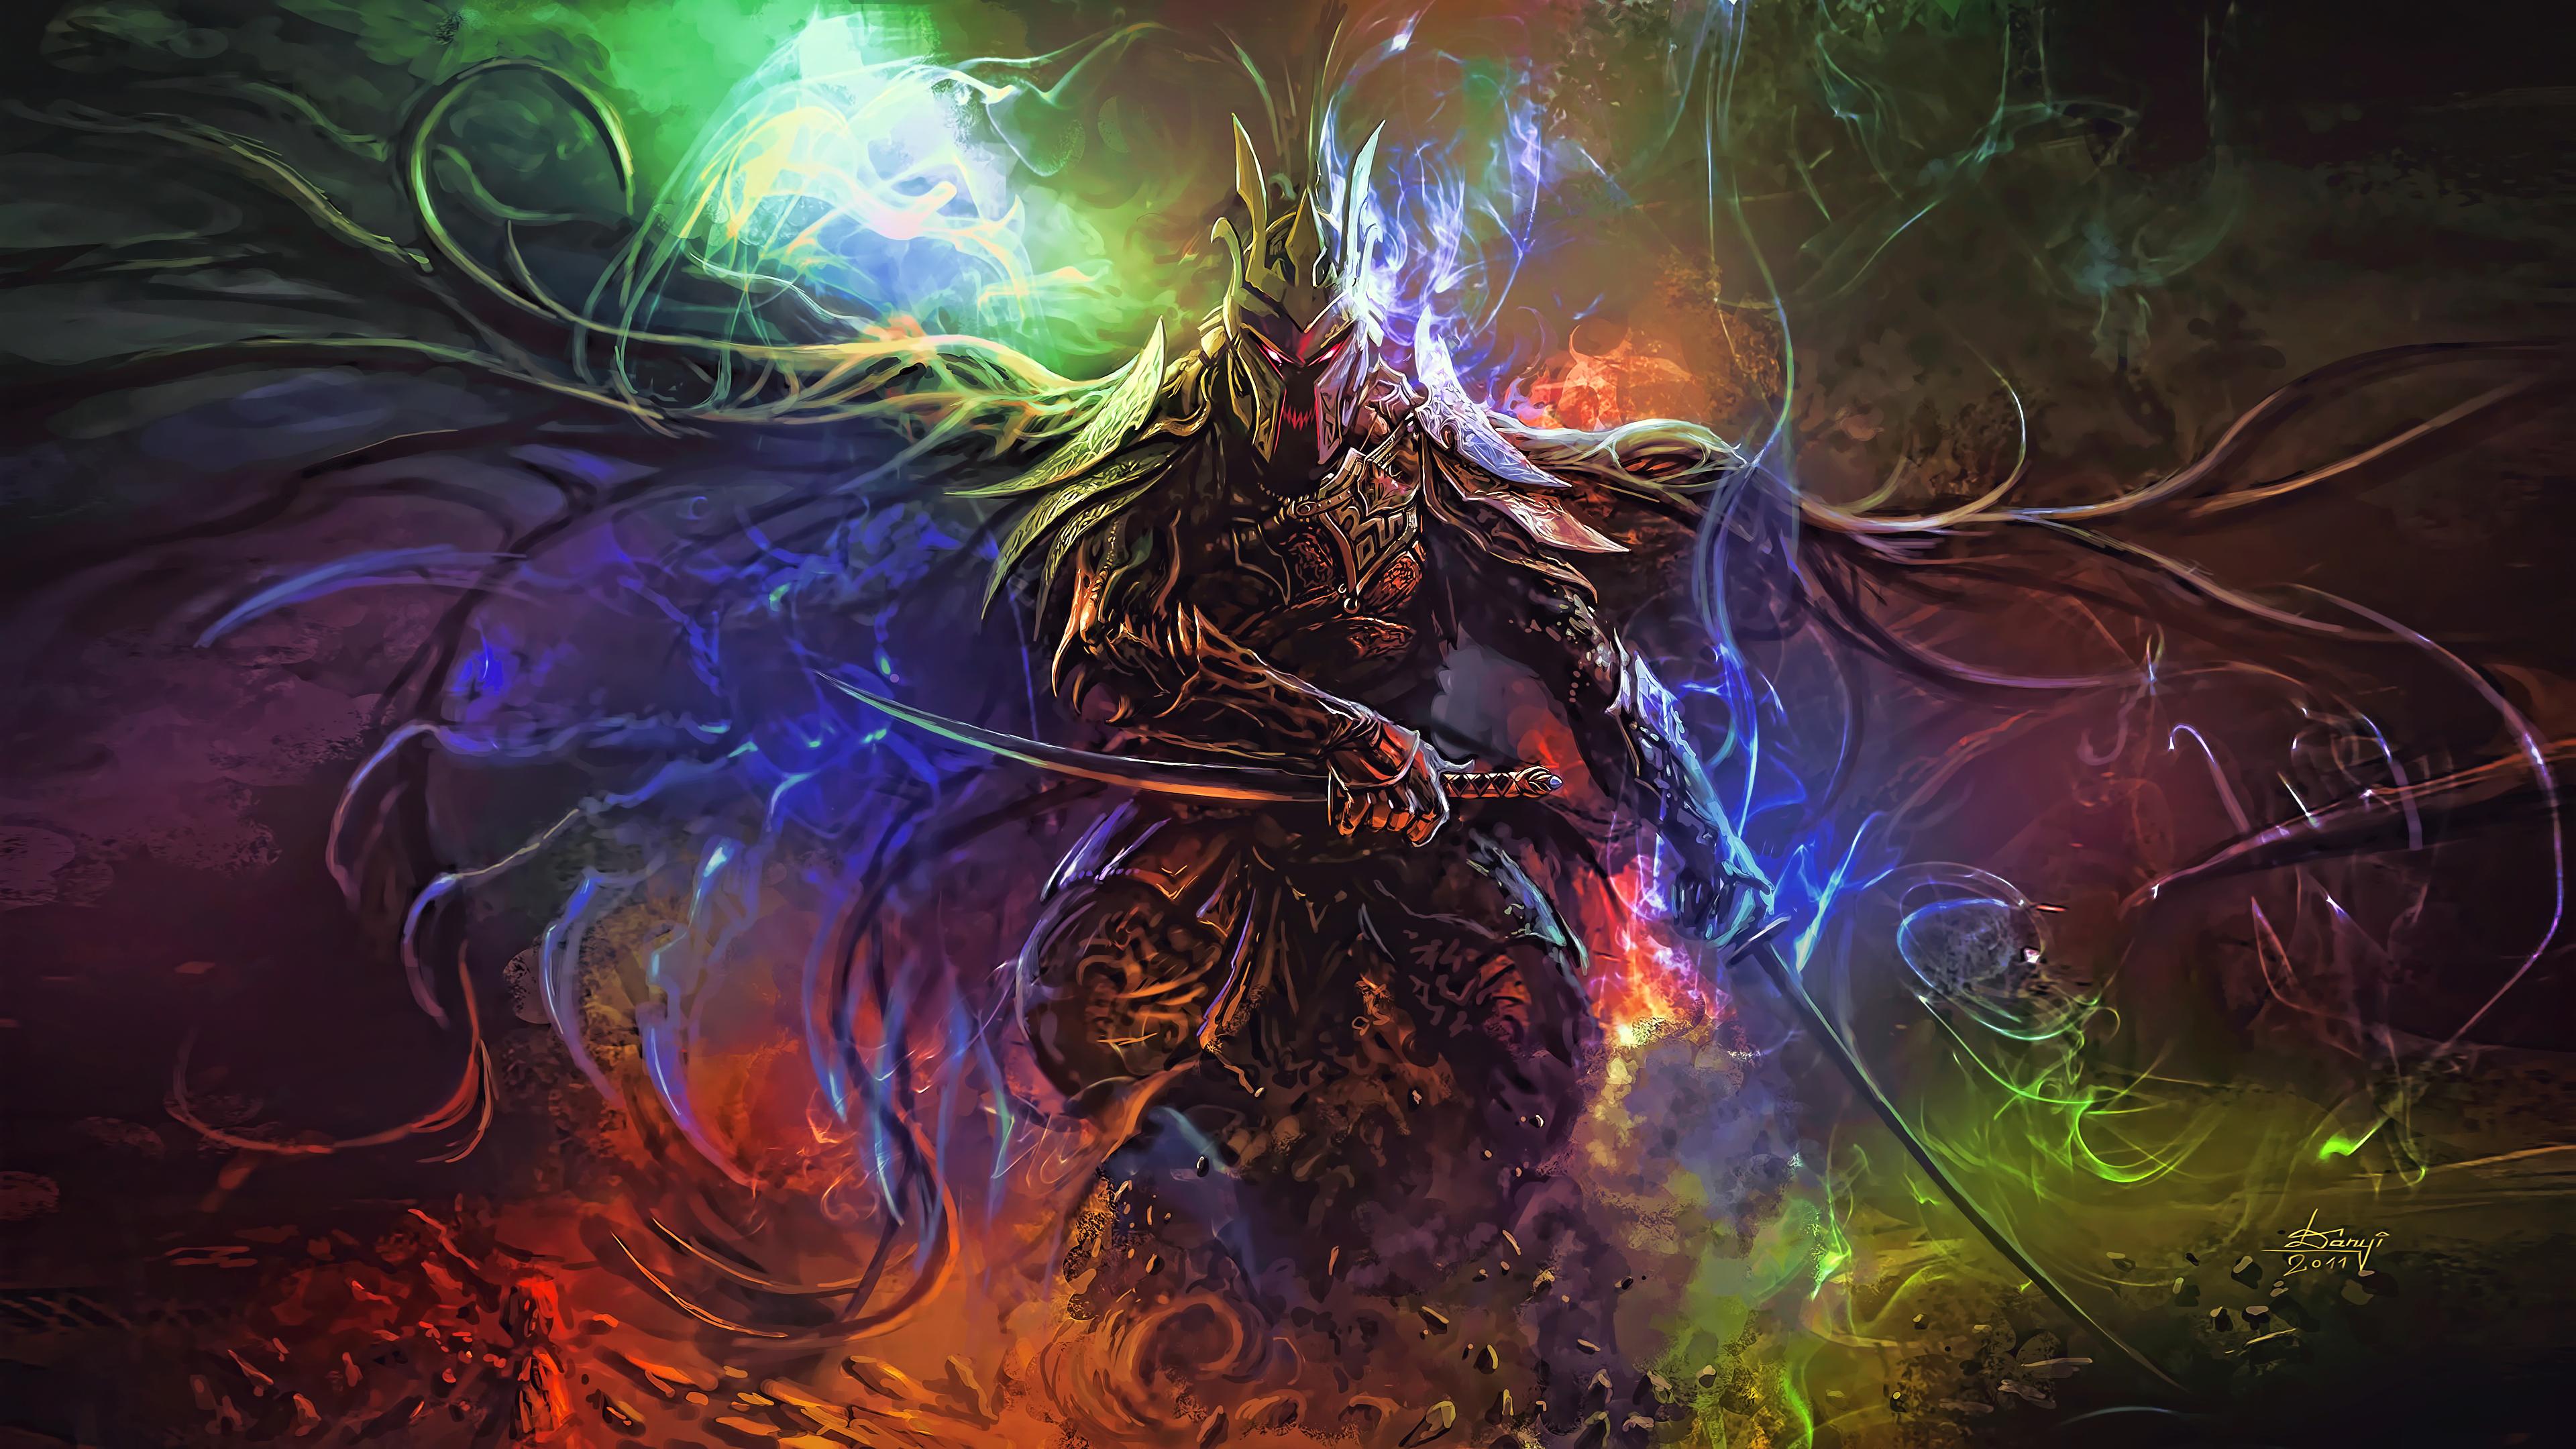 Anime 3840x2160 fantasy art fan art artwork digital art sword warrior